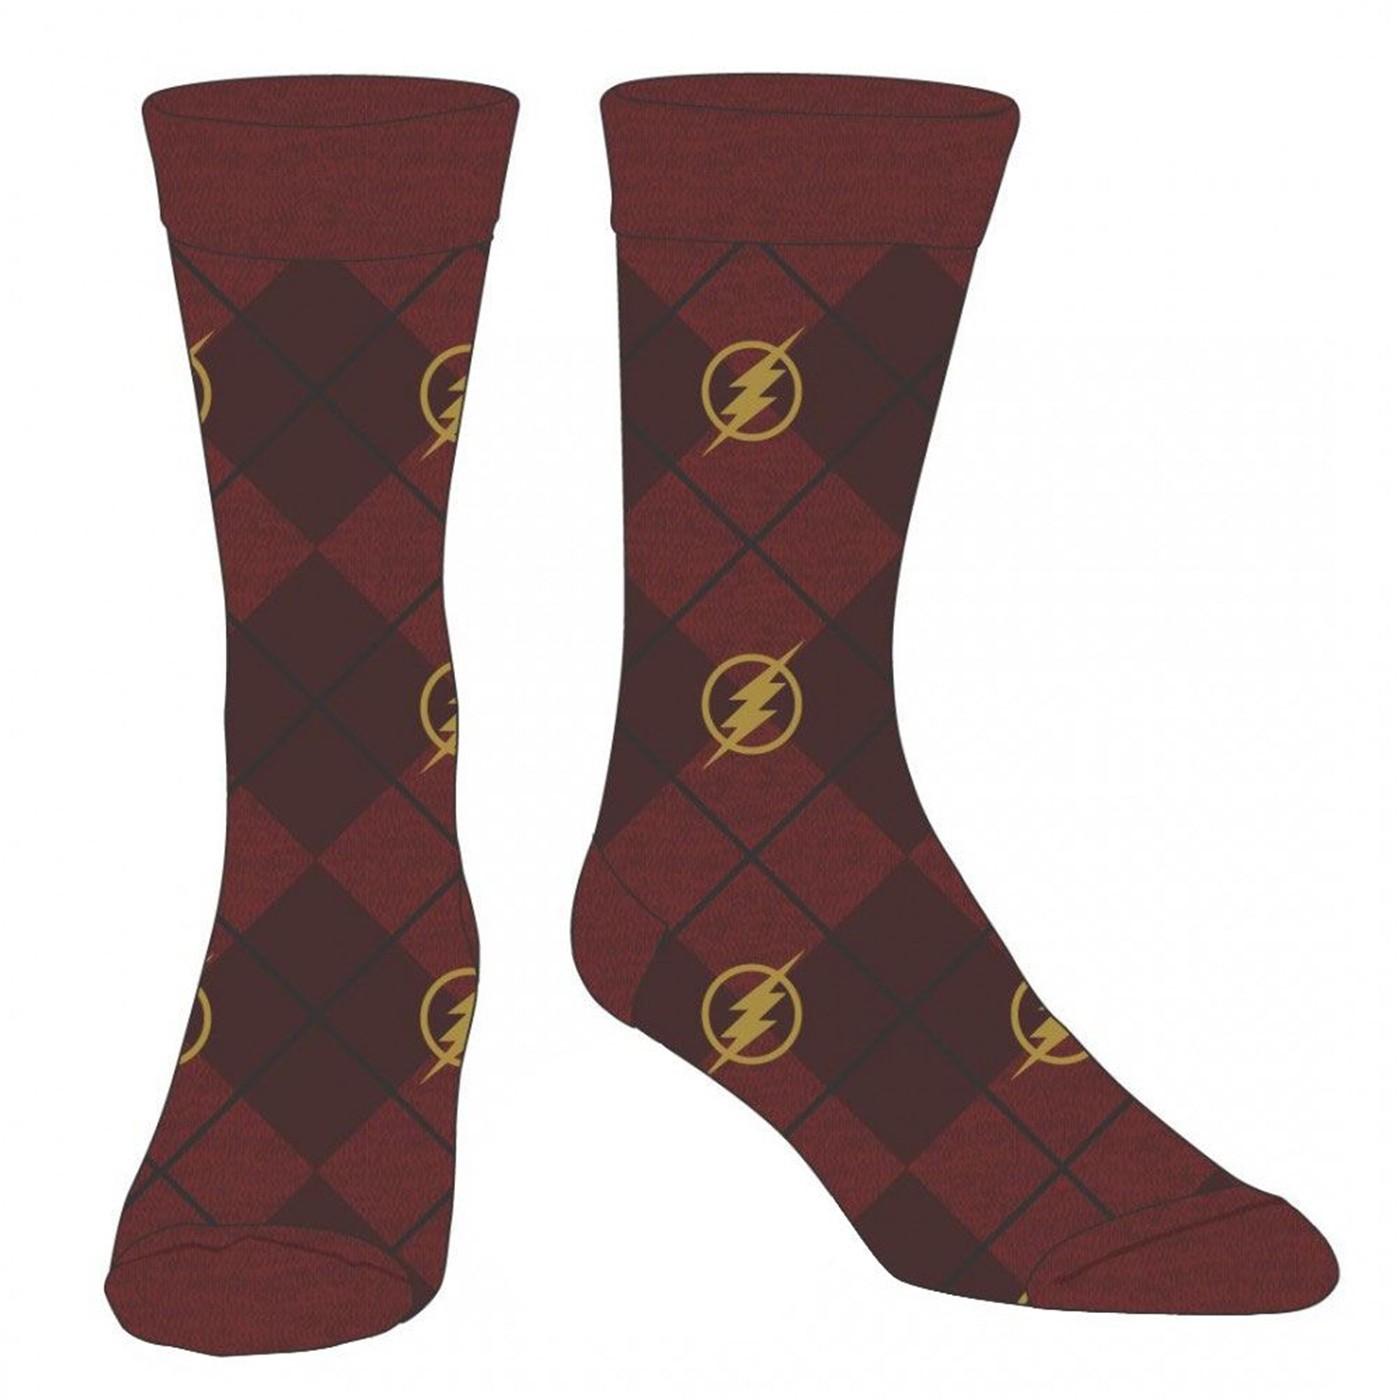 Flash Men's Dress socks